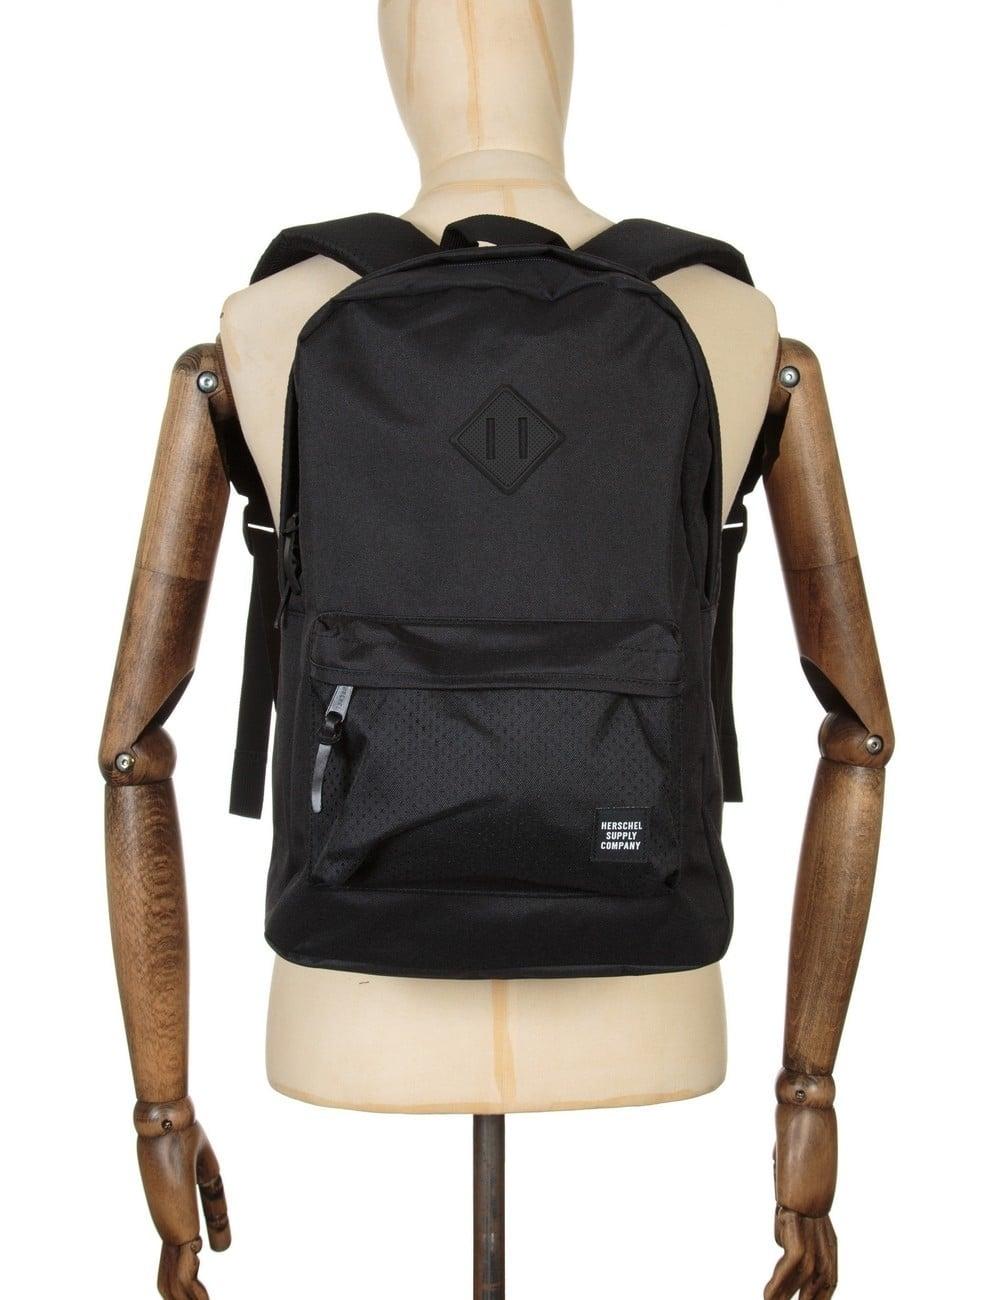 cf273f8a8a0 Herschel Supply Co Heritage 21.5L Backpack - Black Black Rubber ...